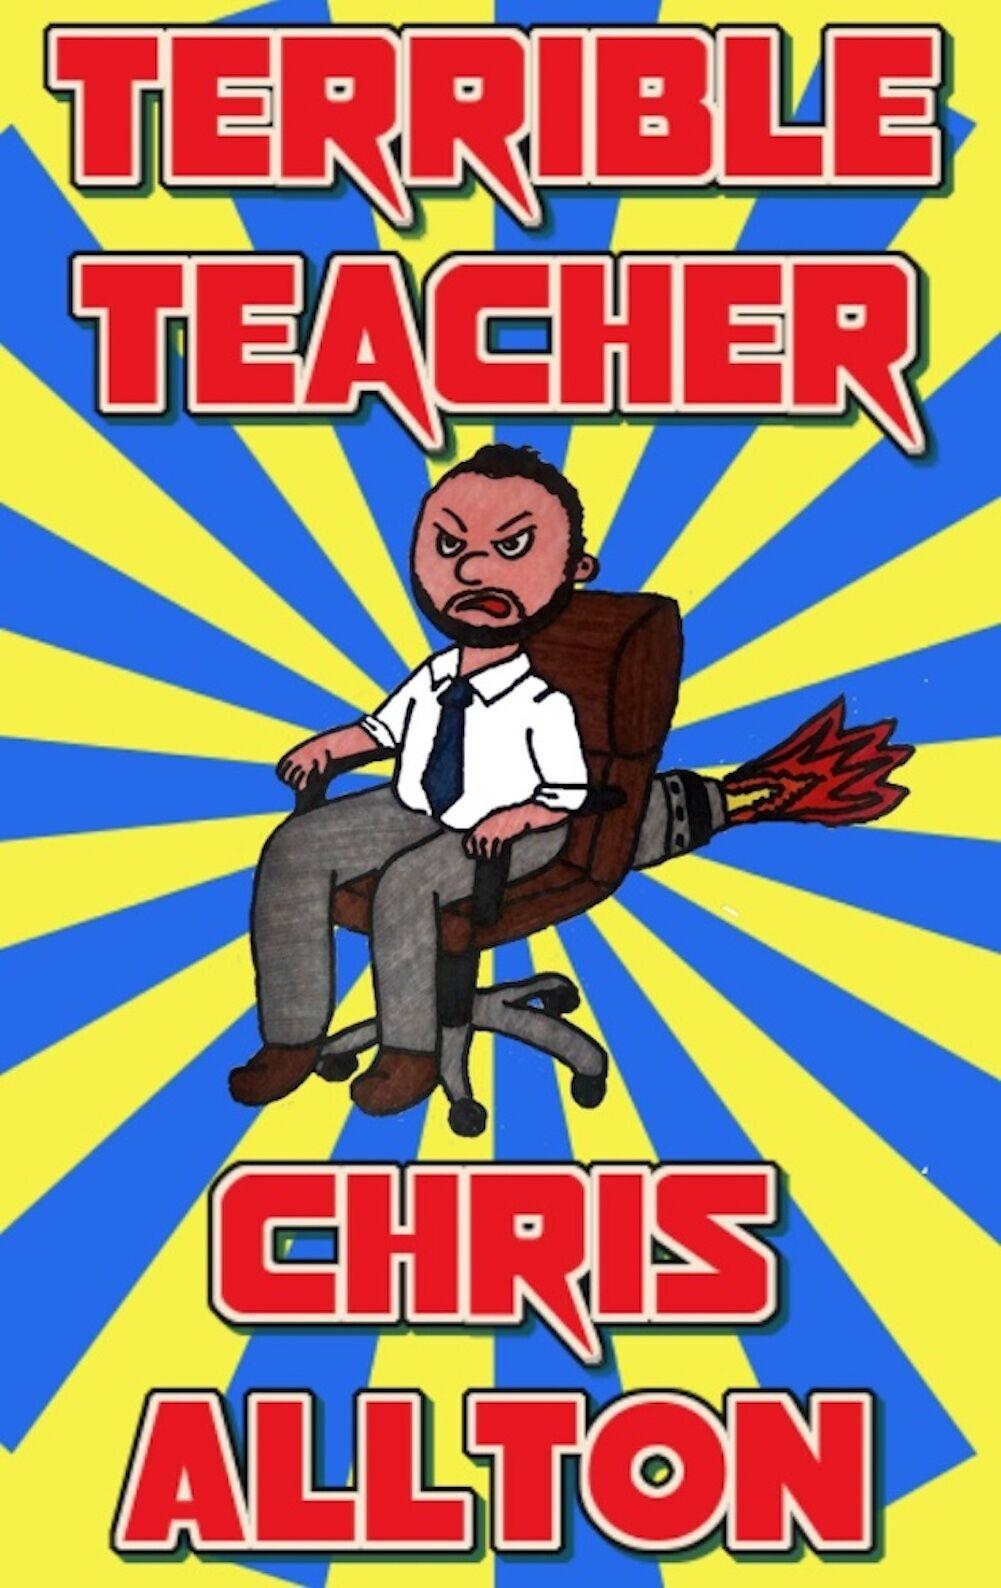 Chris Allton - first image